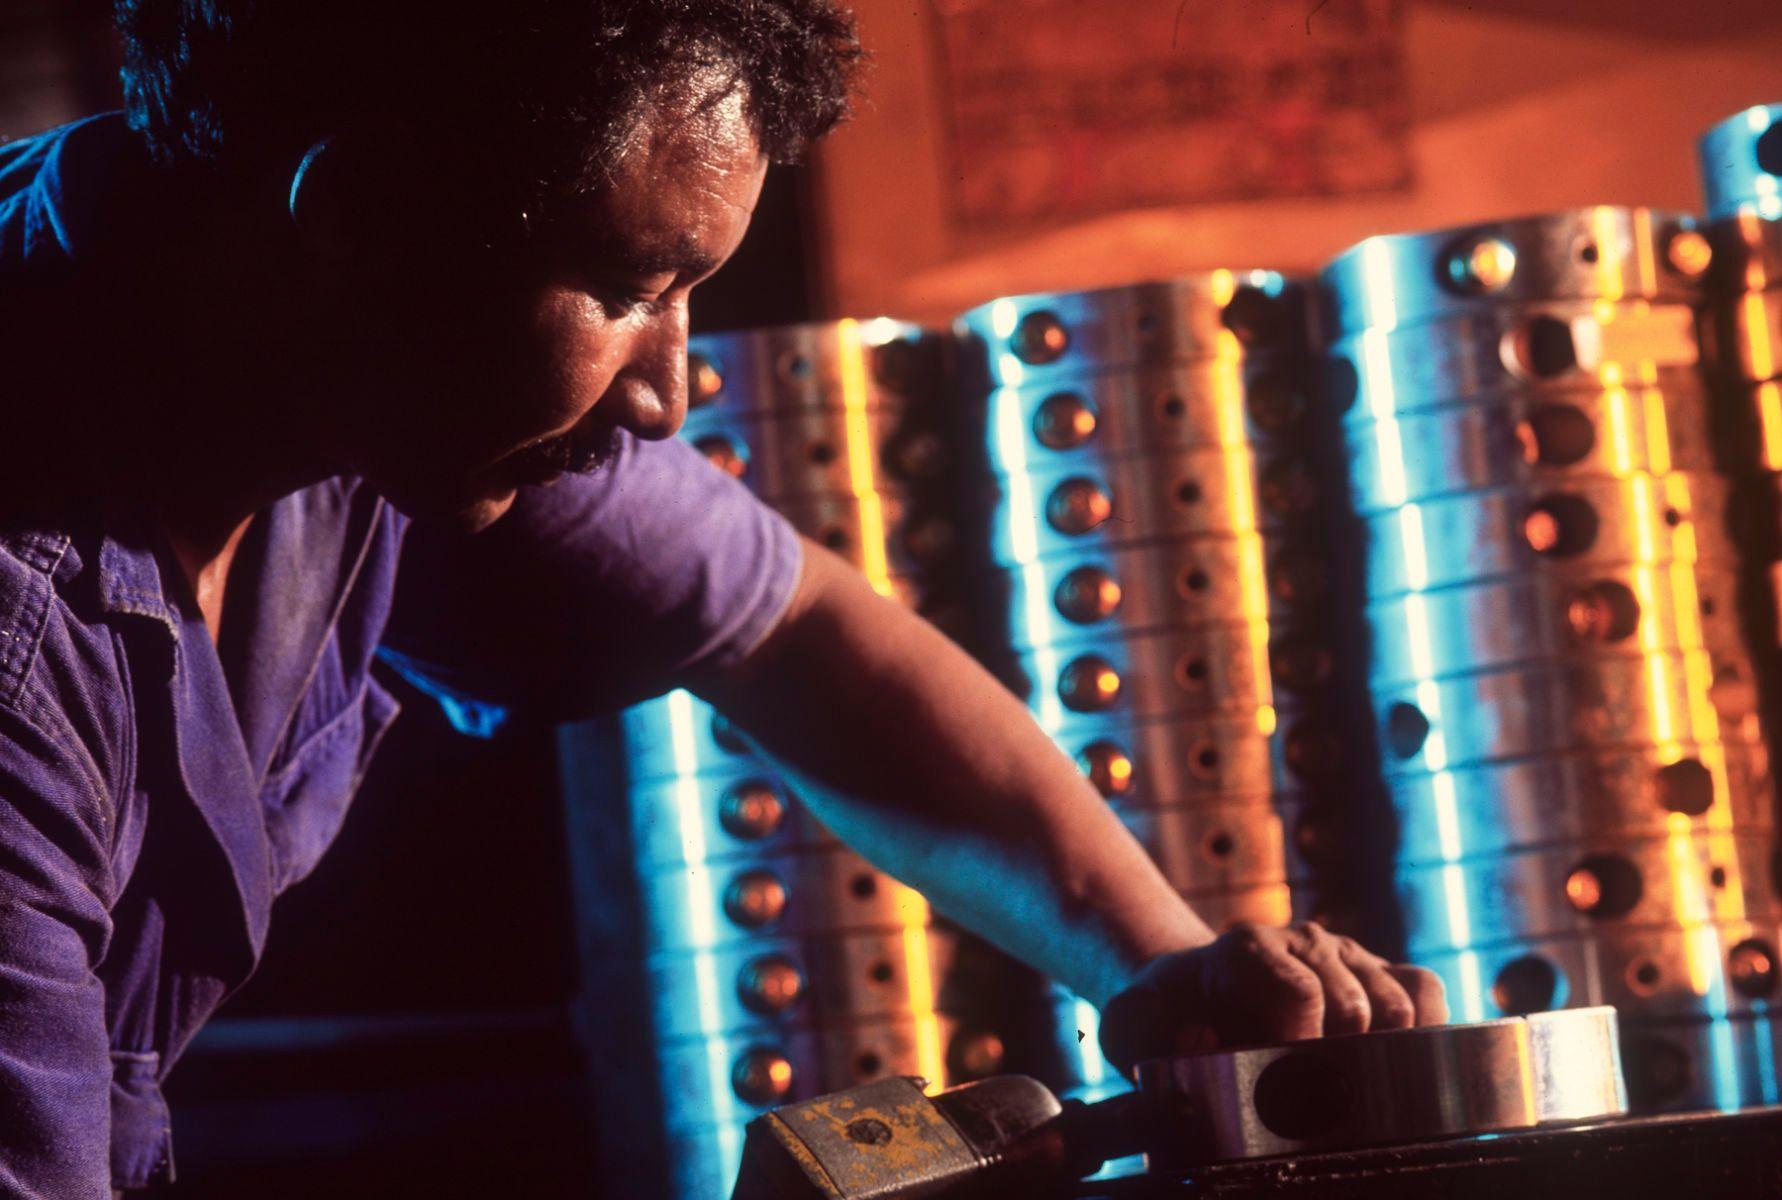 Metal mechanic Industry